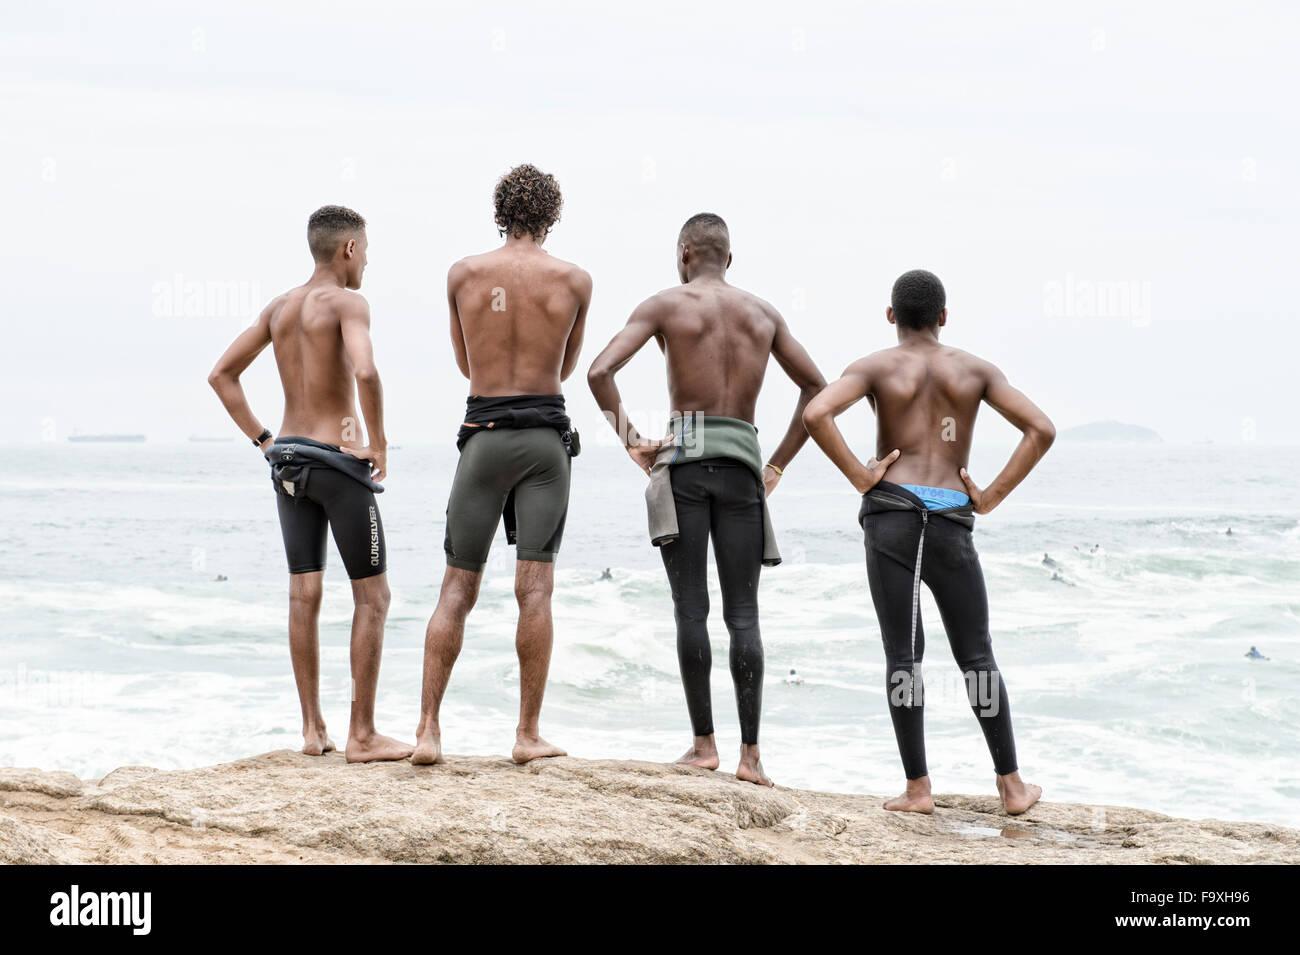 RIO DE JANEIRO, Brésil - 22 octobre 2015: Brazilian surf en combis regarder les vagues à Praia do Photo Stock